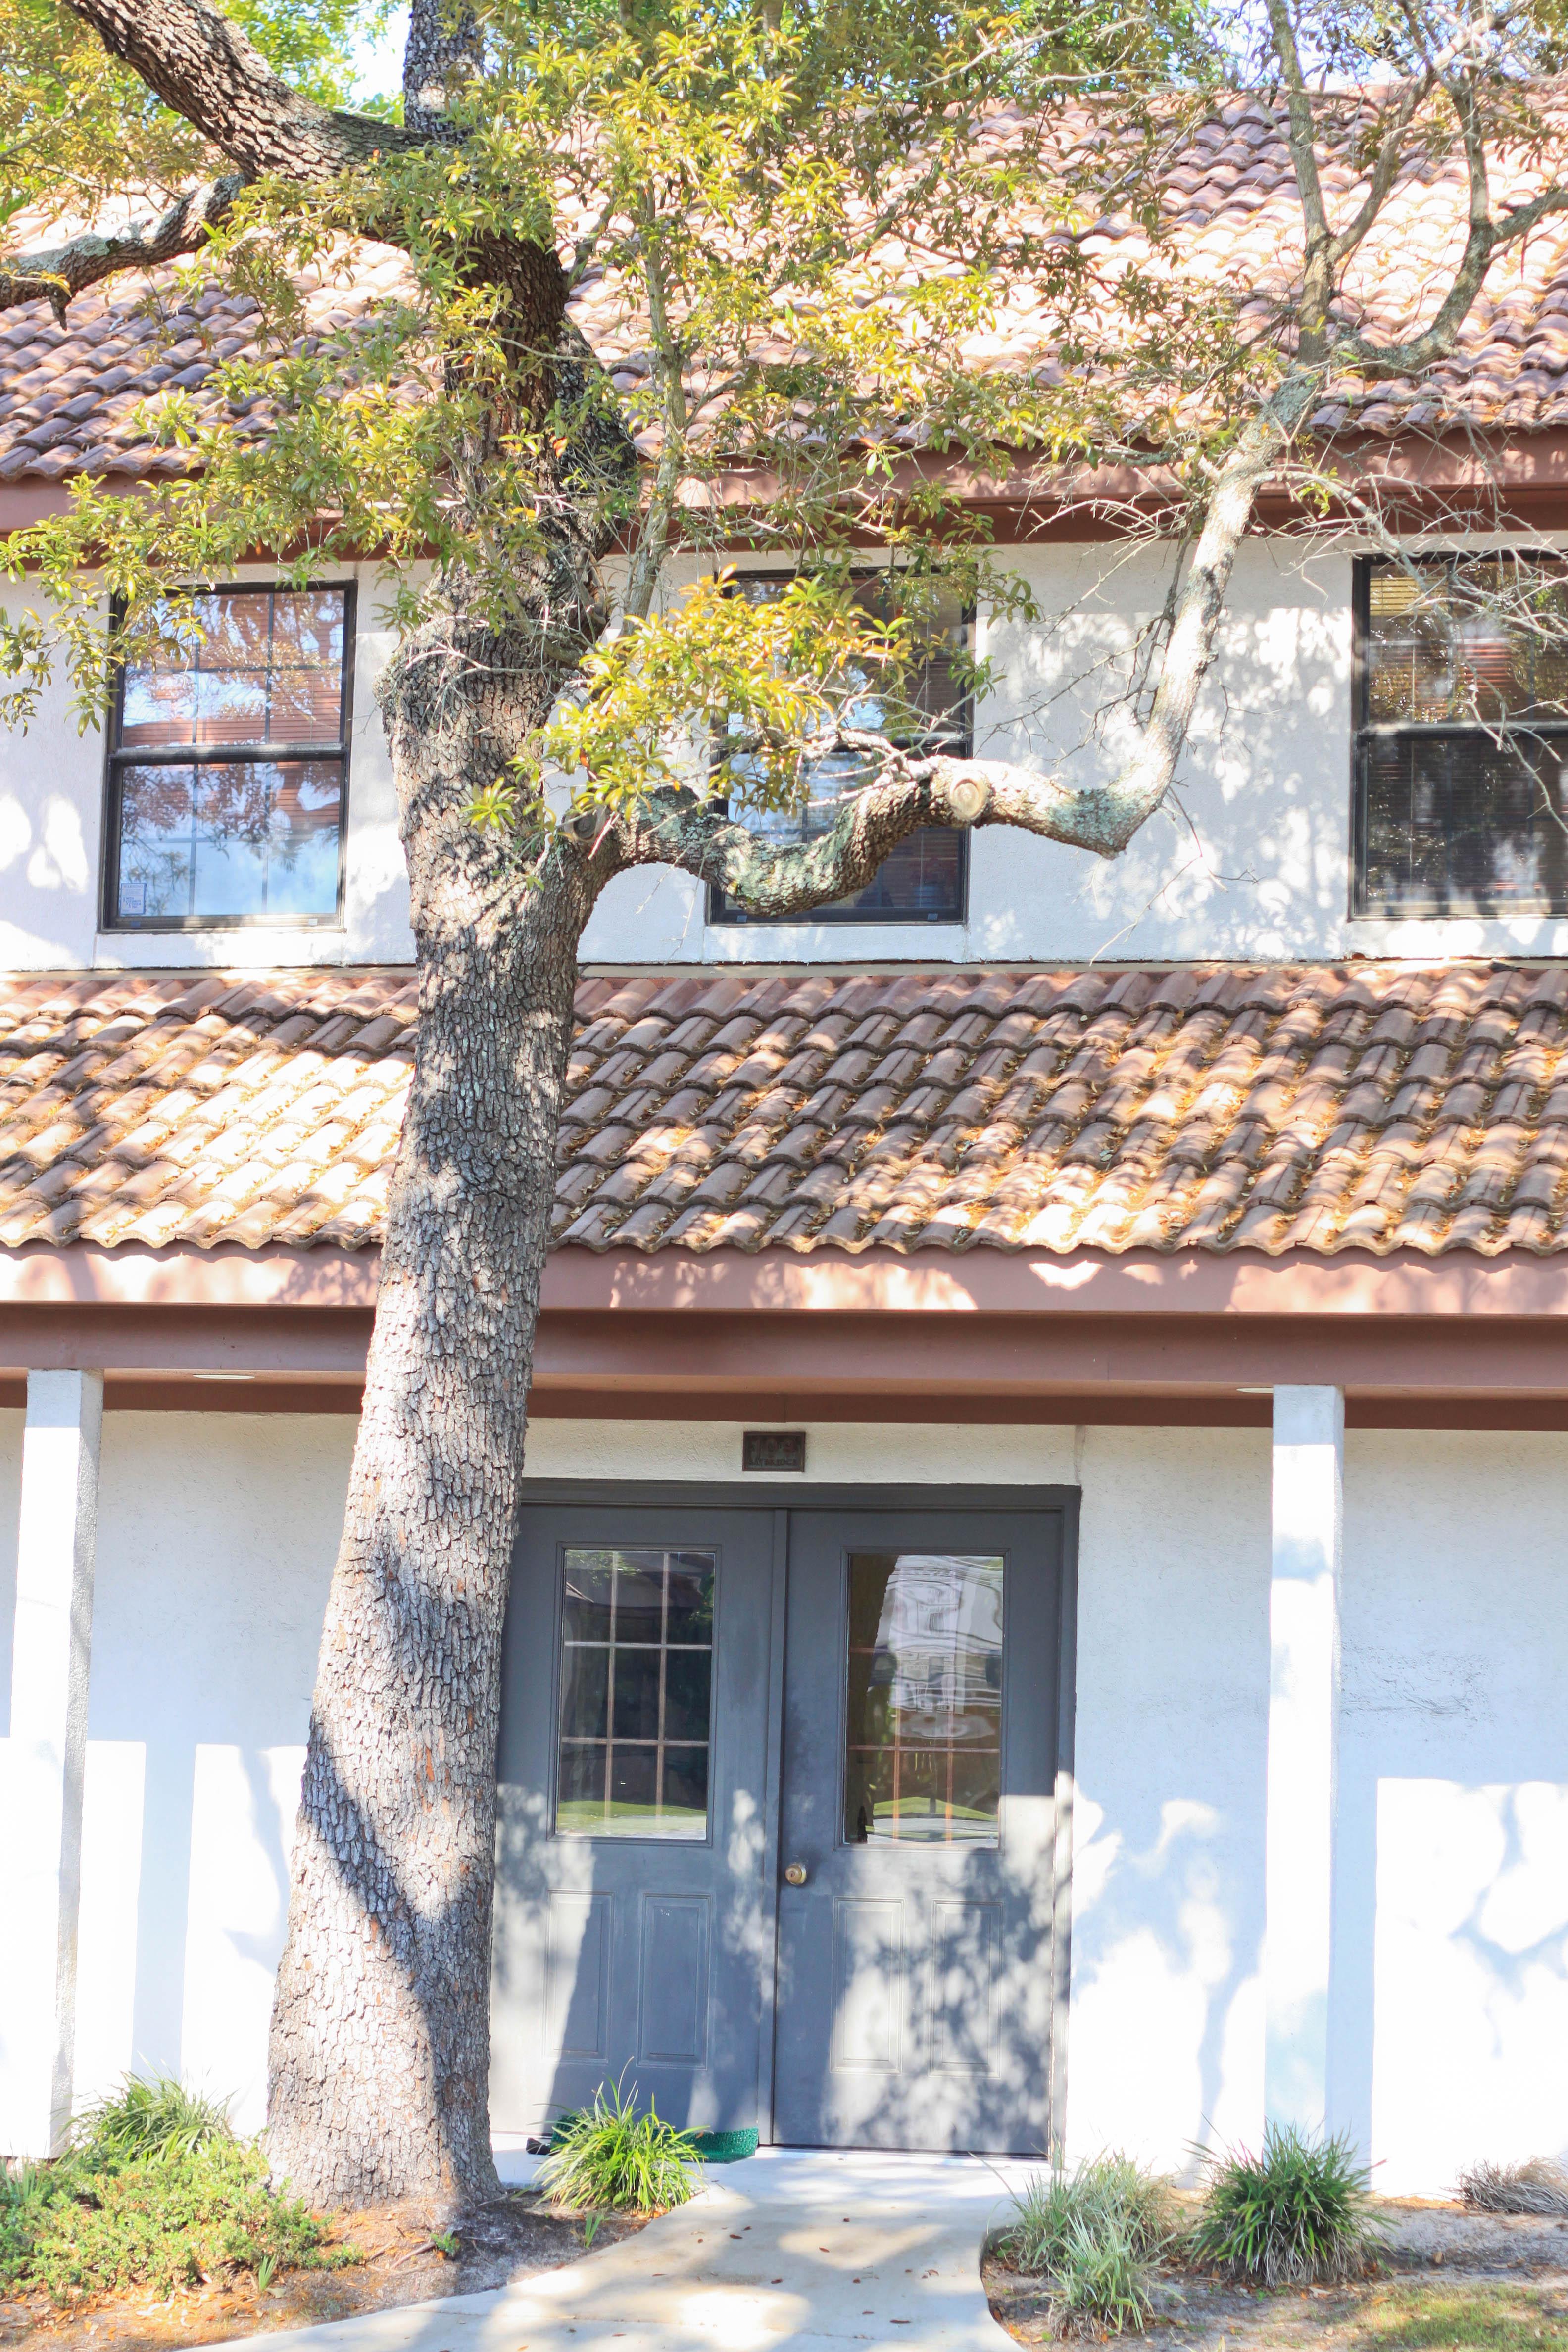 Fort Walton Beach Real Estate Search All Fort Walton Beach Homes Condos